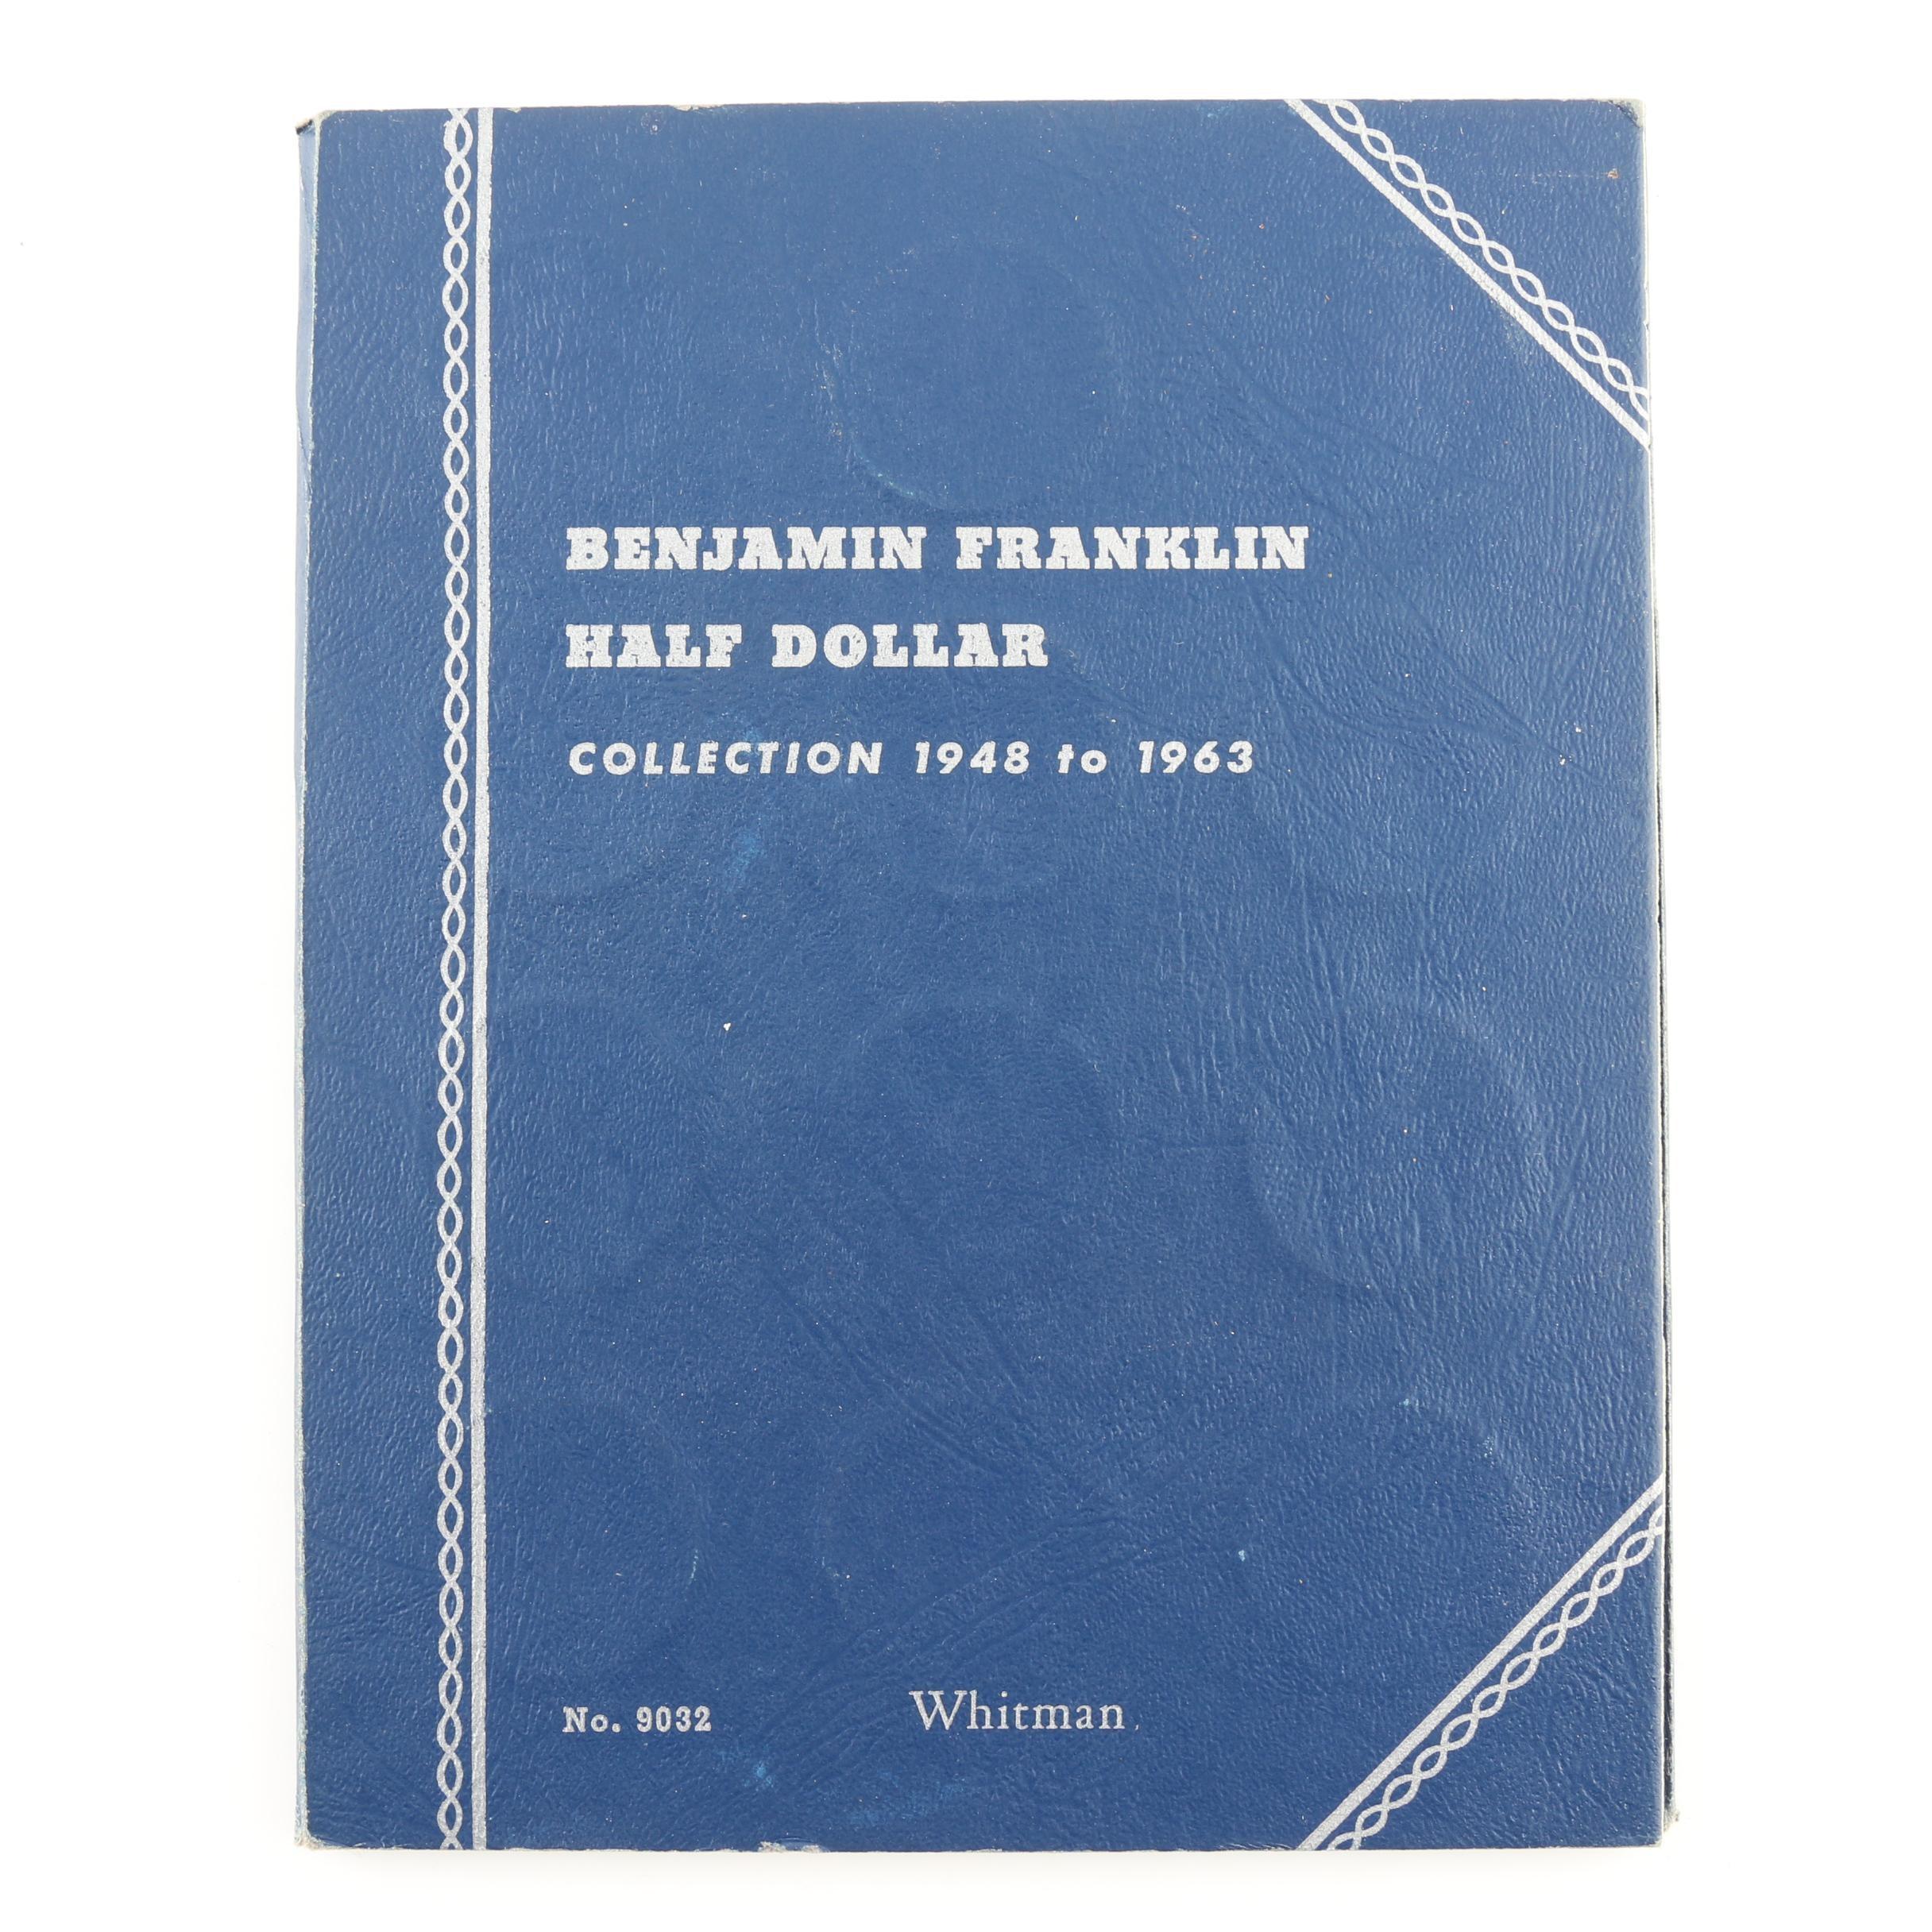 Whitman Binder of Franklin Silver Half Dollars